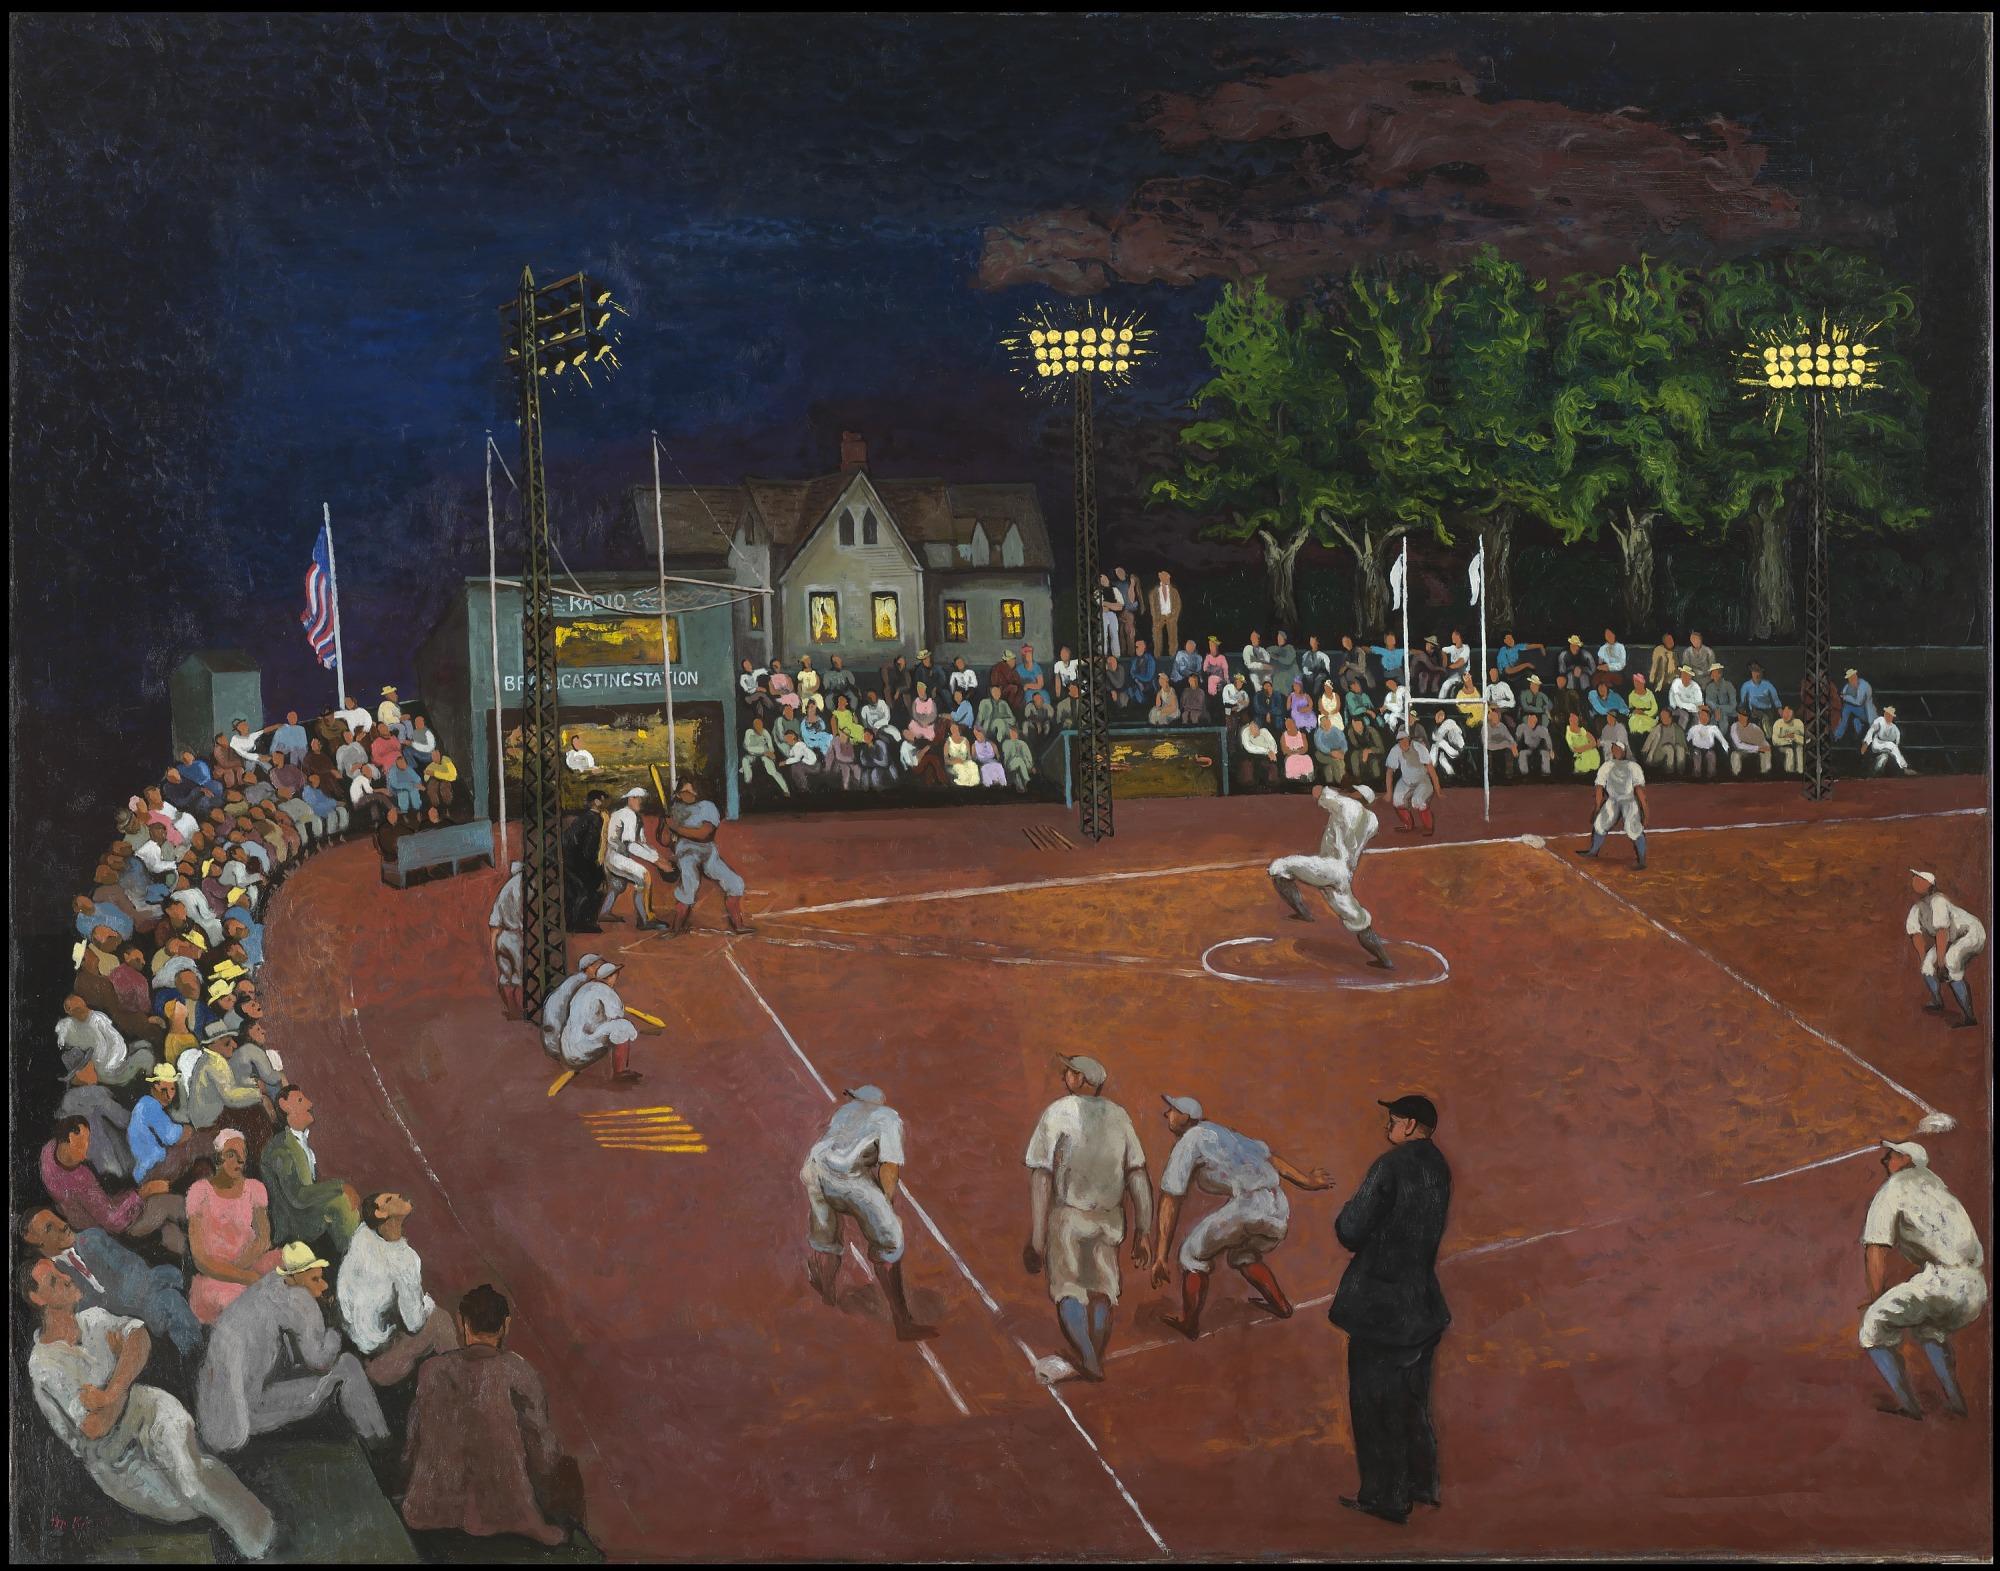 Baseball at night | smithsonian american art museum.